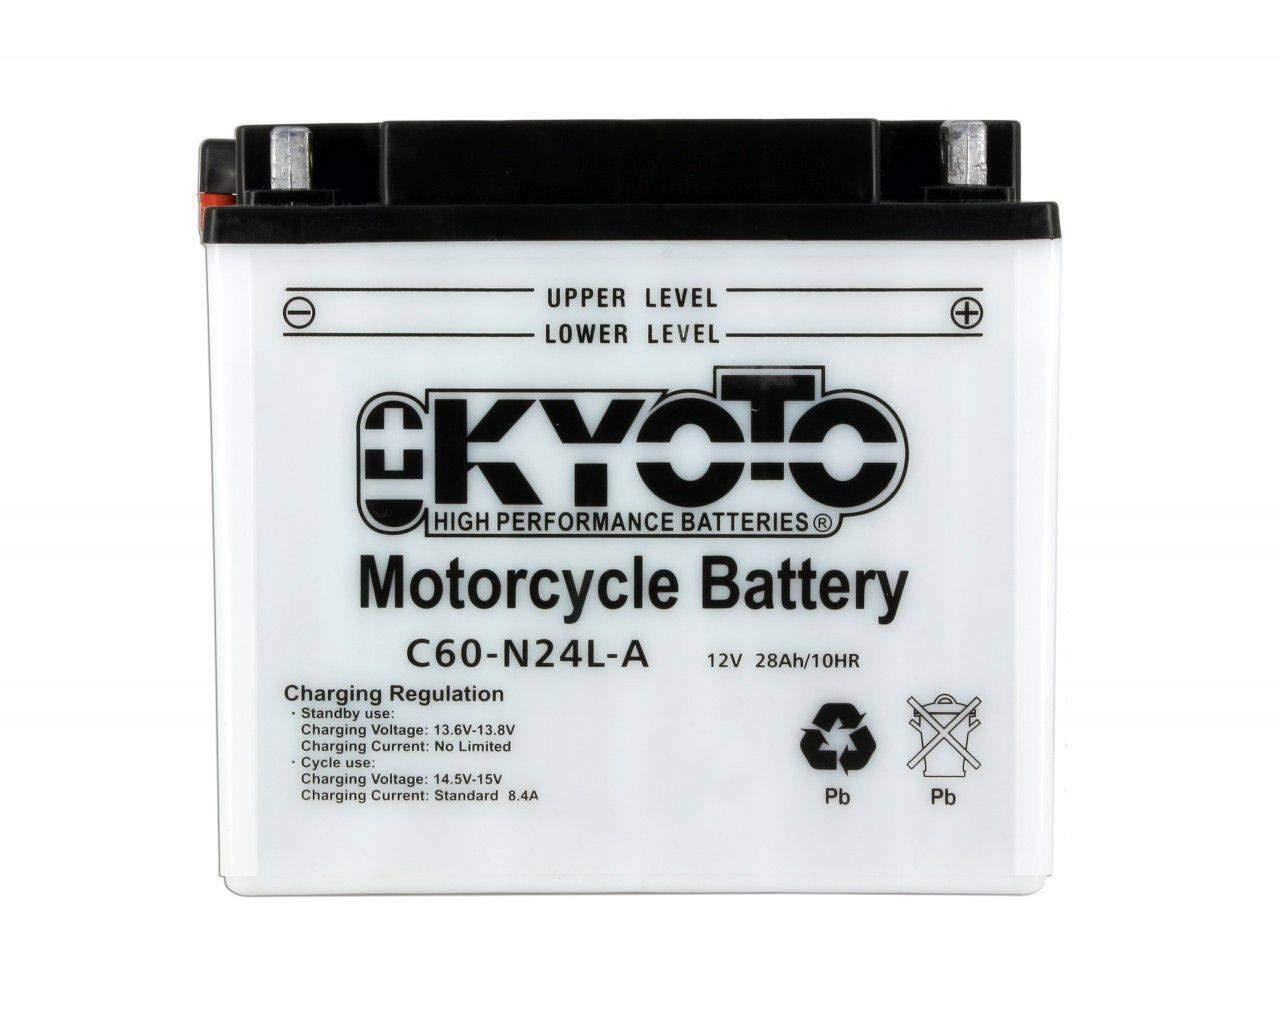 Baterí a Kyoto Y60-N24L-A 712281